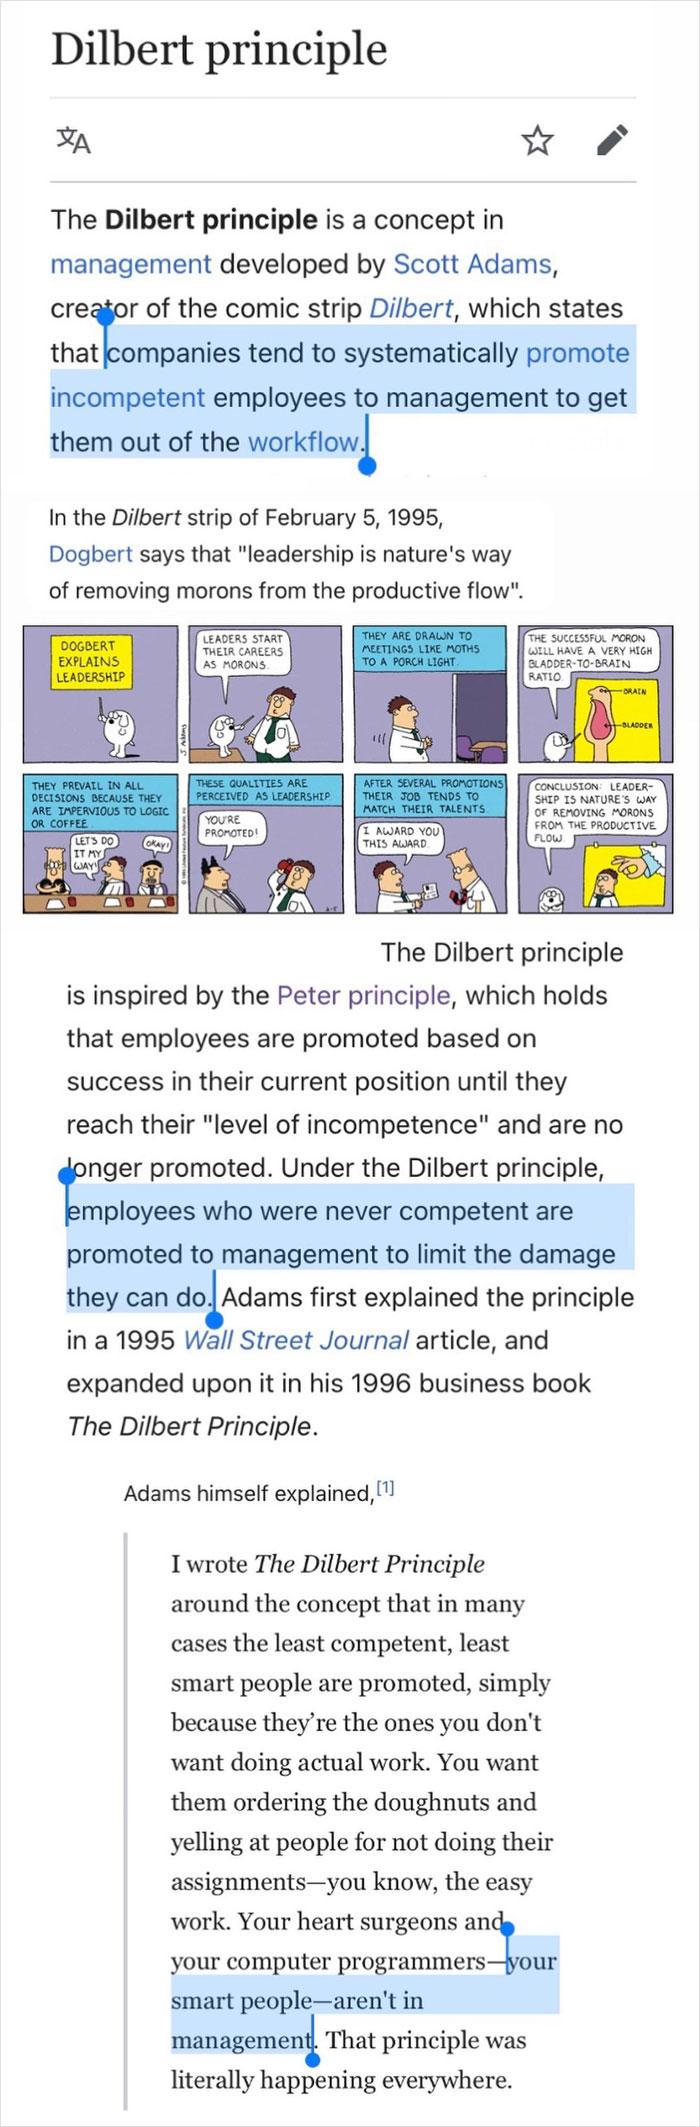 Dilbert Principle